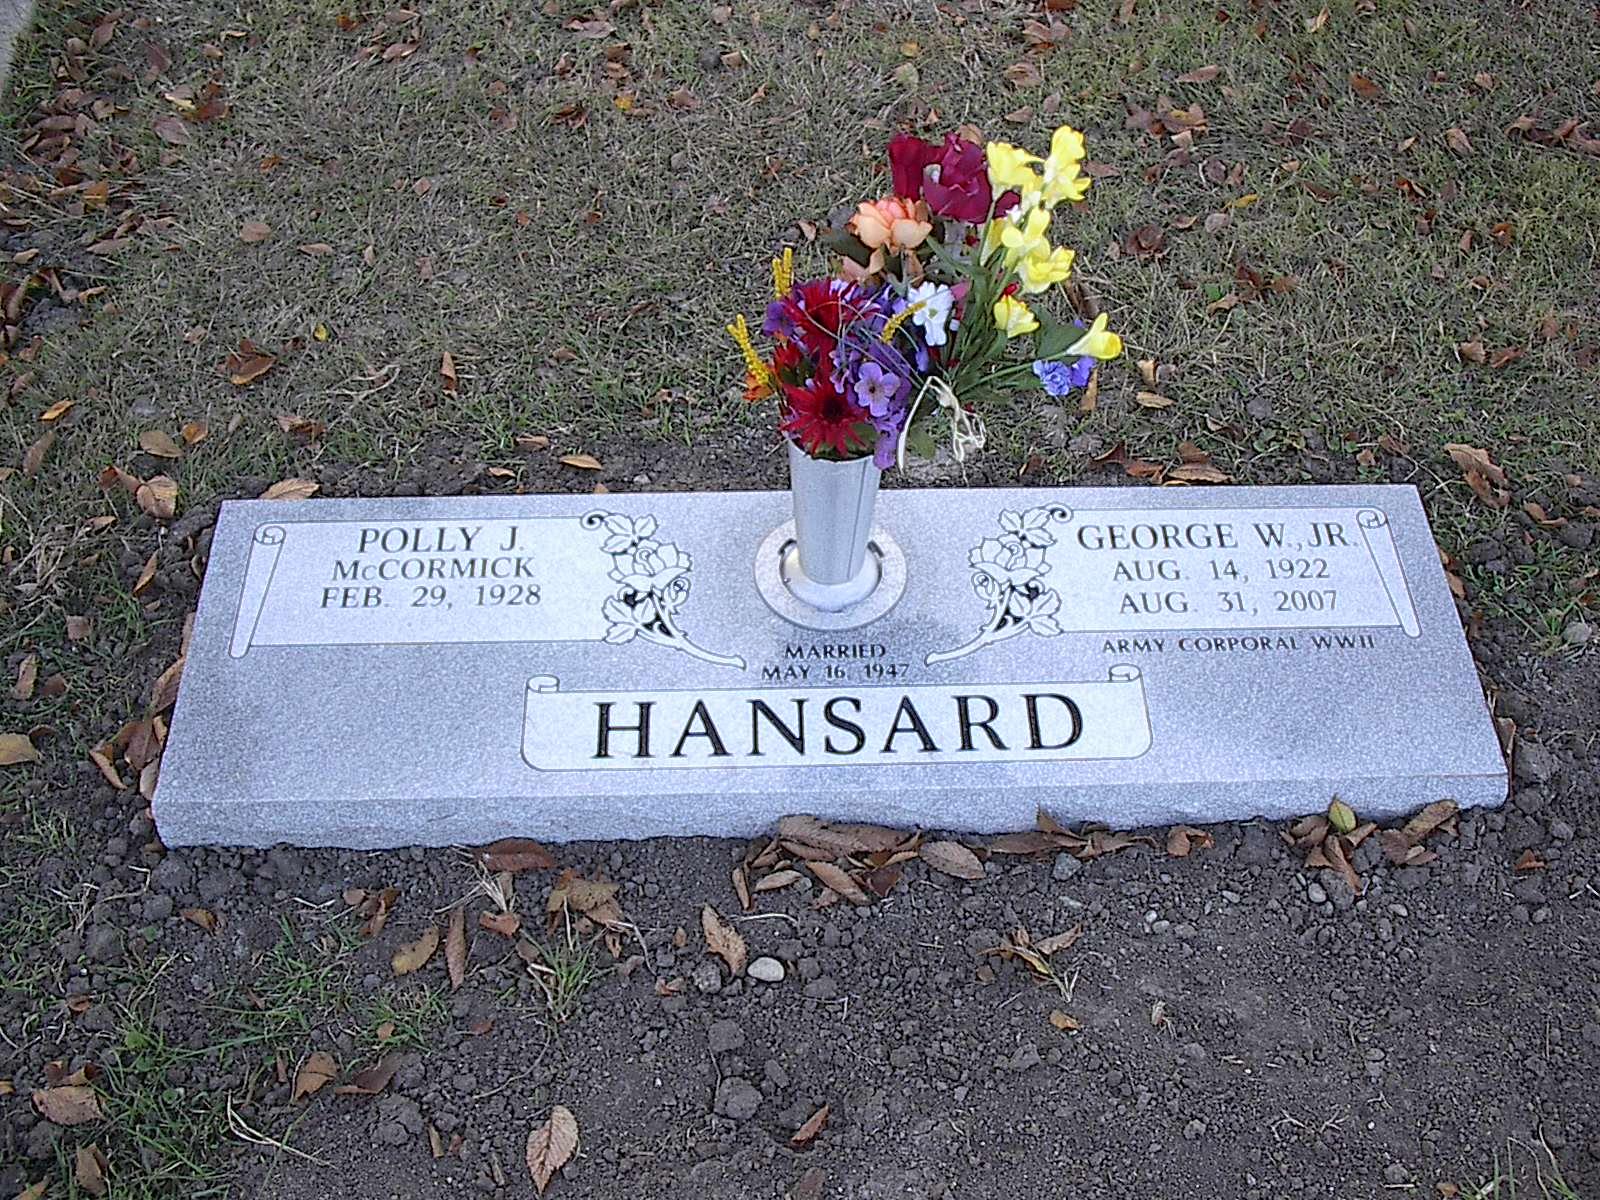 HANSARD